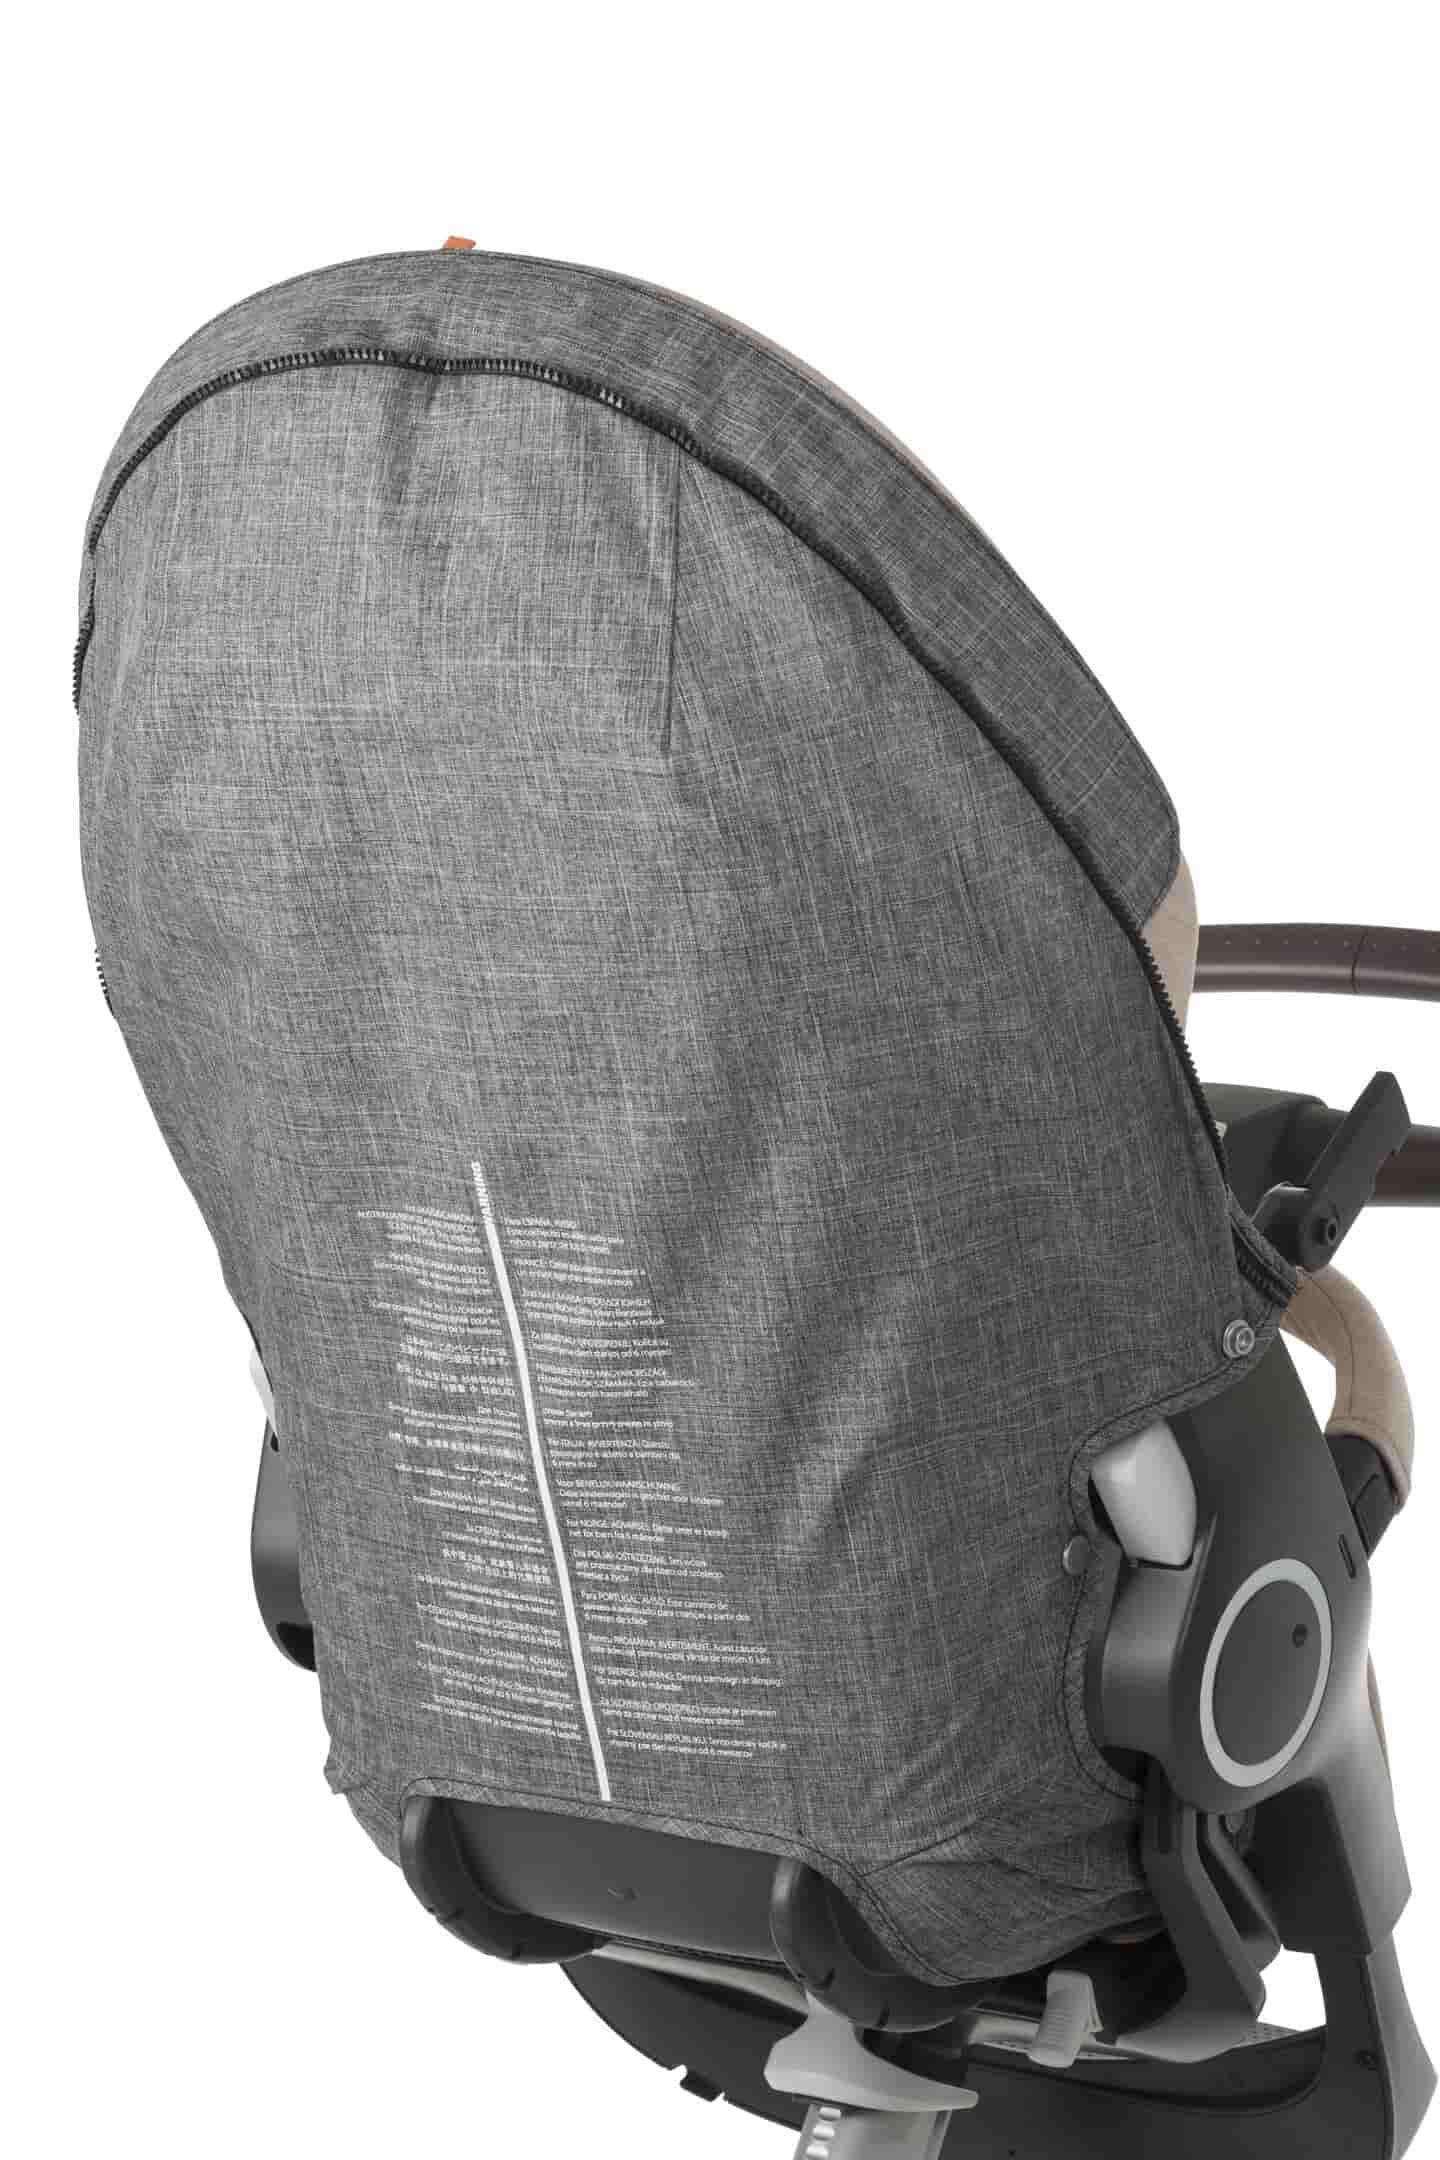 da:,de:,en:da:,de:,en:Stokke® Stroller Seat spare part. 179311 Stokke® Stroller Seat Rear Textile Cover Black Melange.,en-US:,es:,fr:,it:,ja:,ko:,nl:,no:,pl:,pt:,ru:,sv:,tr:,zh:,zh-CN:,en-US:,es:,fr:,it:,ja:,ko:,nl:,no:,pl:,pt:,ru:,sv:,tr:,zh:,zh-CN: view 2